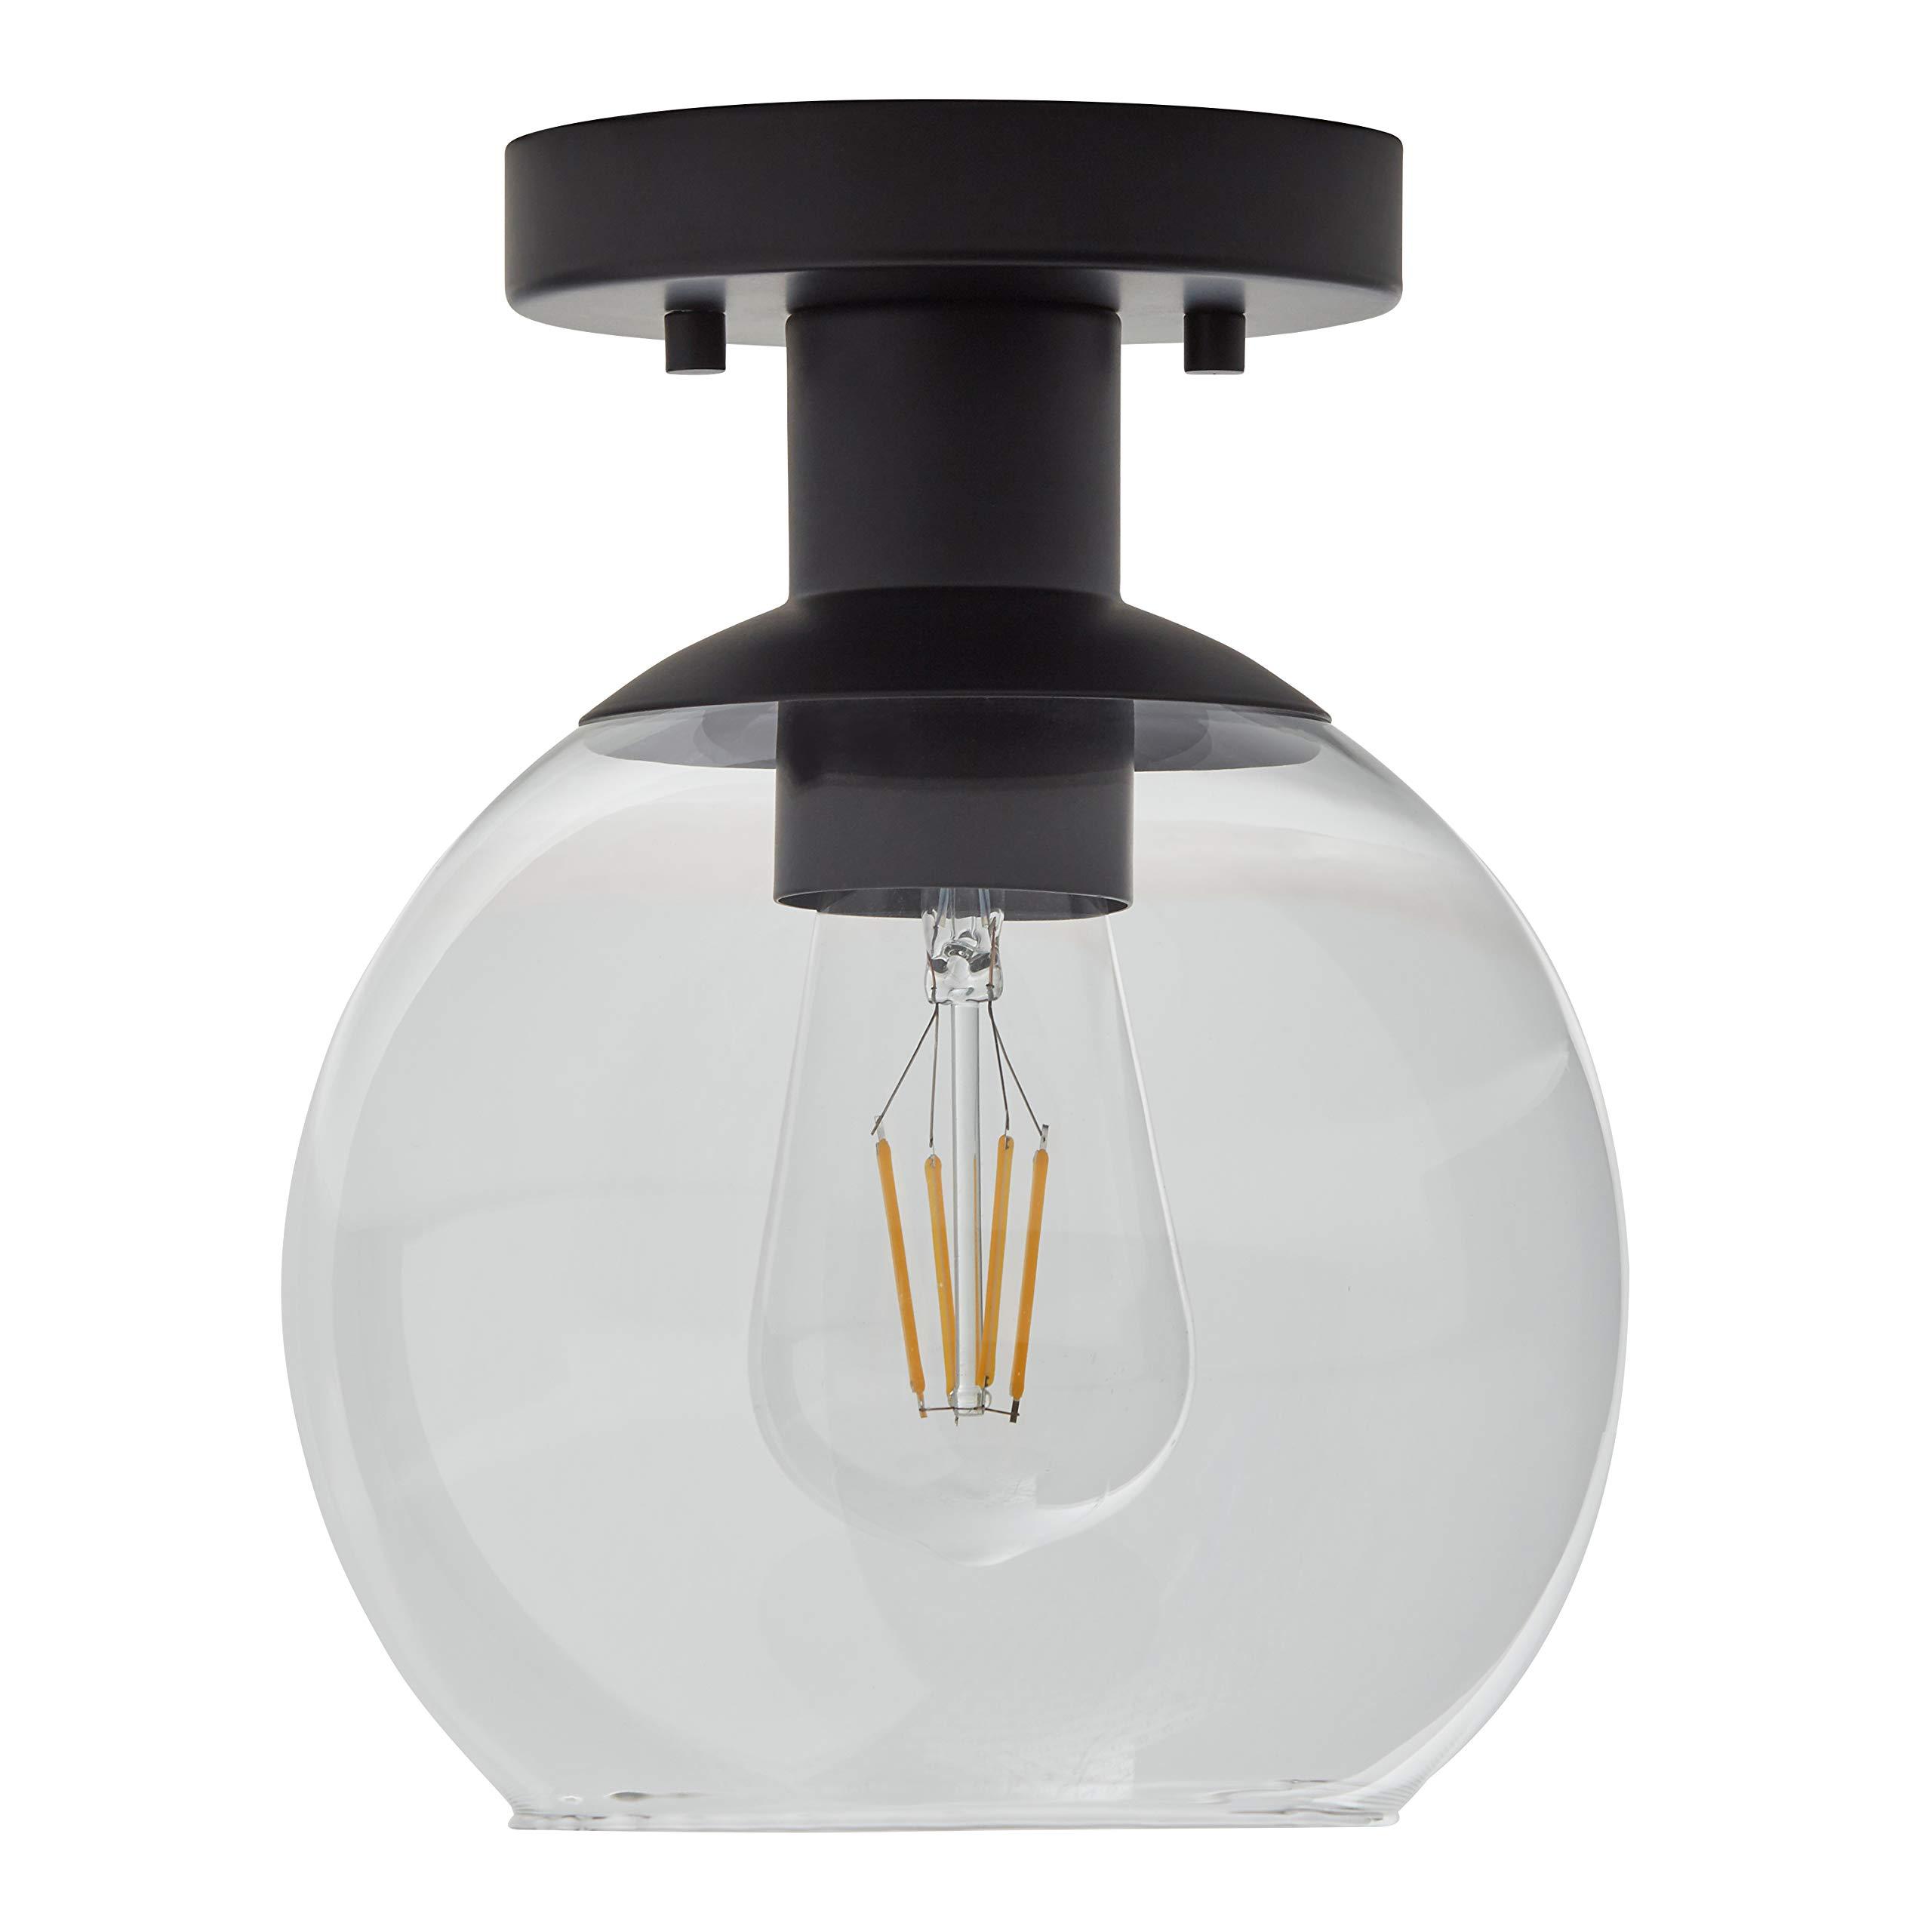 Amazon Brand – Rivet Mid-Century Modern Glass Globe Flush-Mount Ceiling Fixture with Light Bulb - 8.87 x 7 x 7 Inches, Black